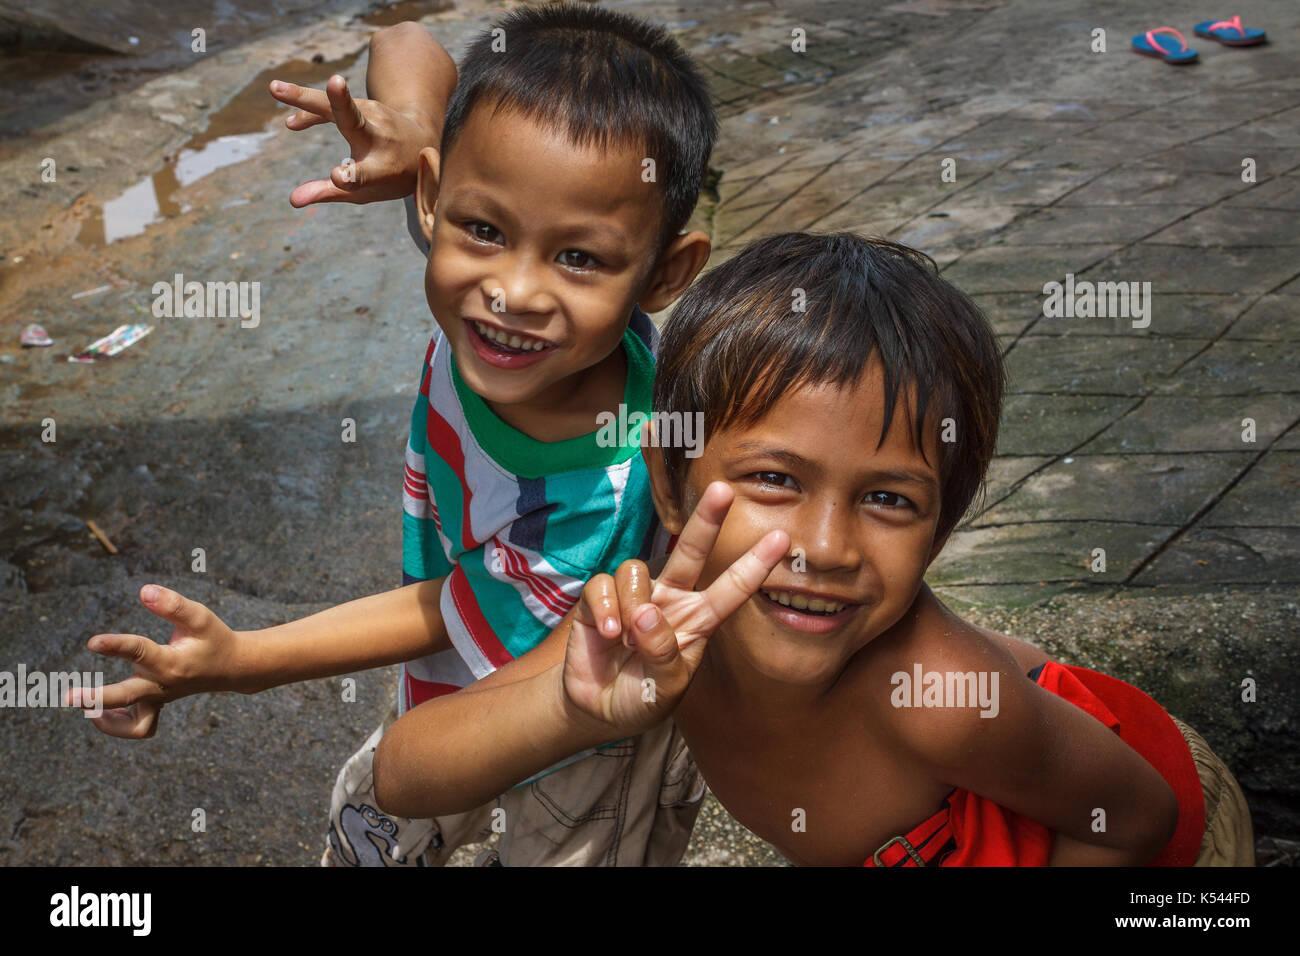 Cambodia Boy Child Stock Photos & Cambodia Boy Child Stock